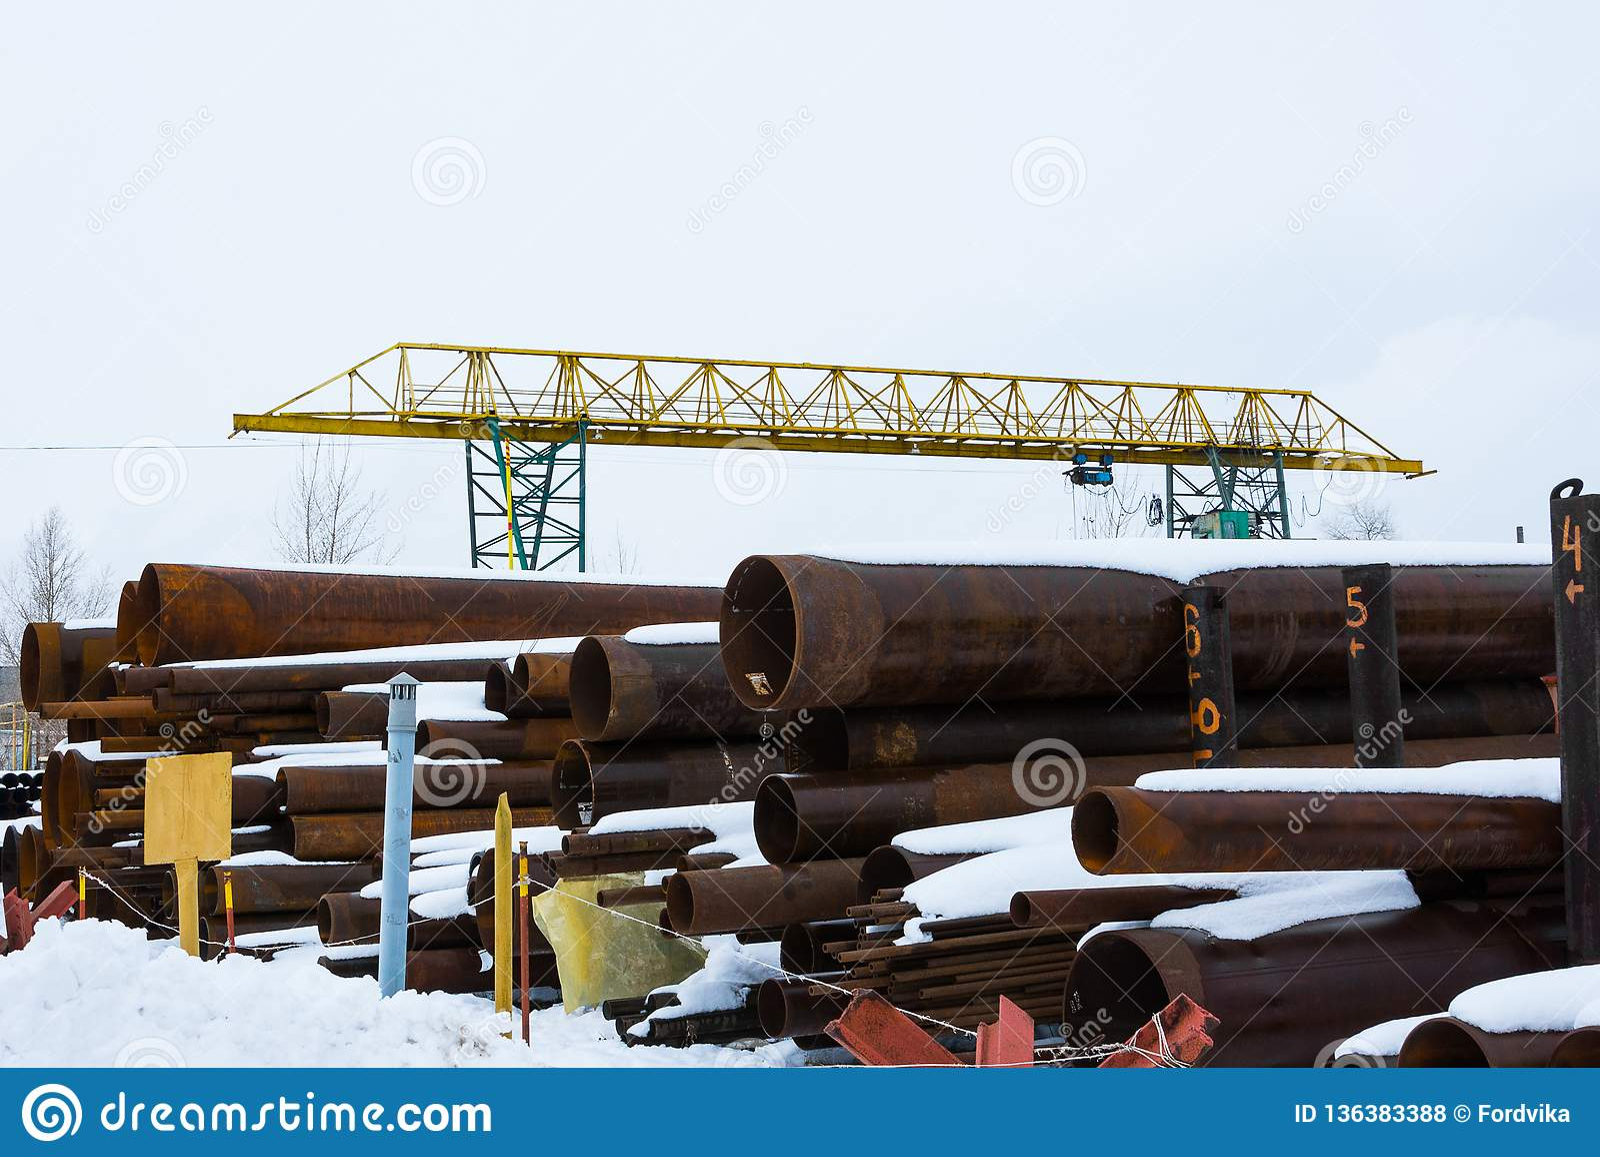 Metal rolling. A round tube large diameter